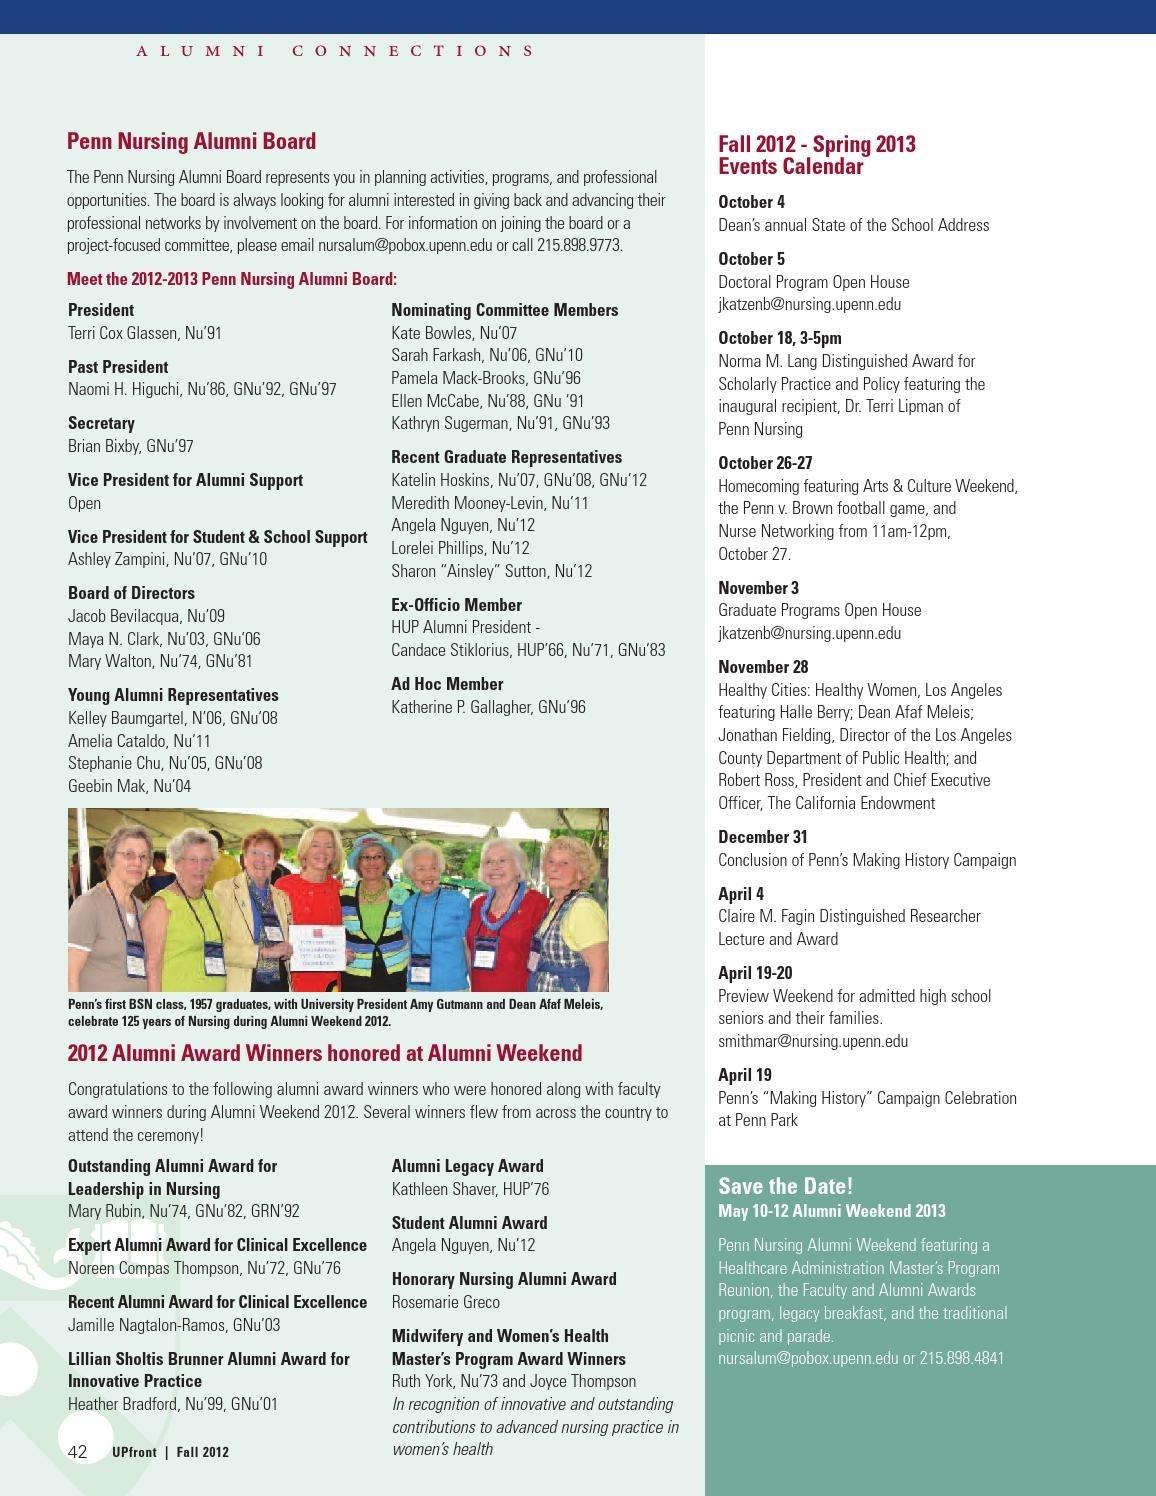 Penn Nursing Upfront: Fall 2012Pennnursing - Issuu